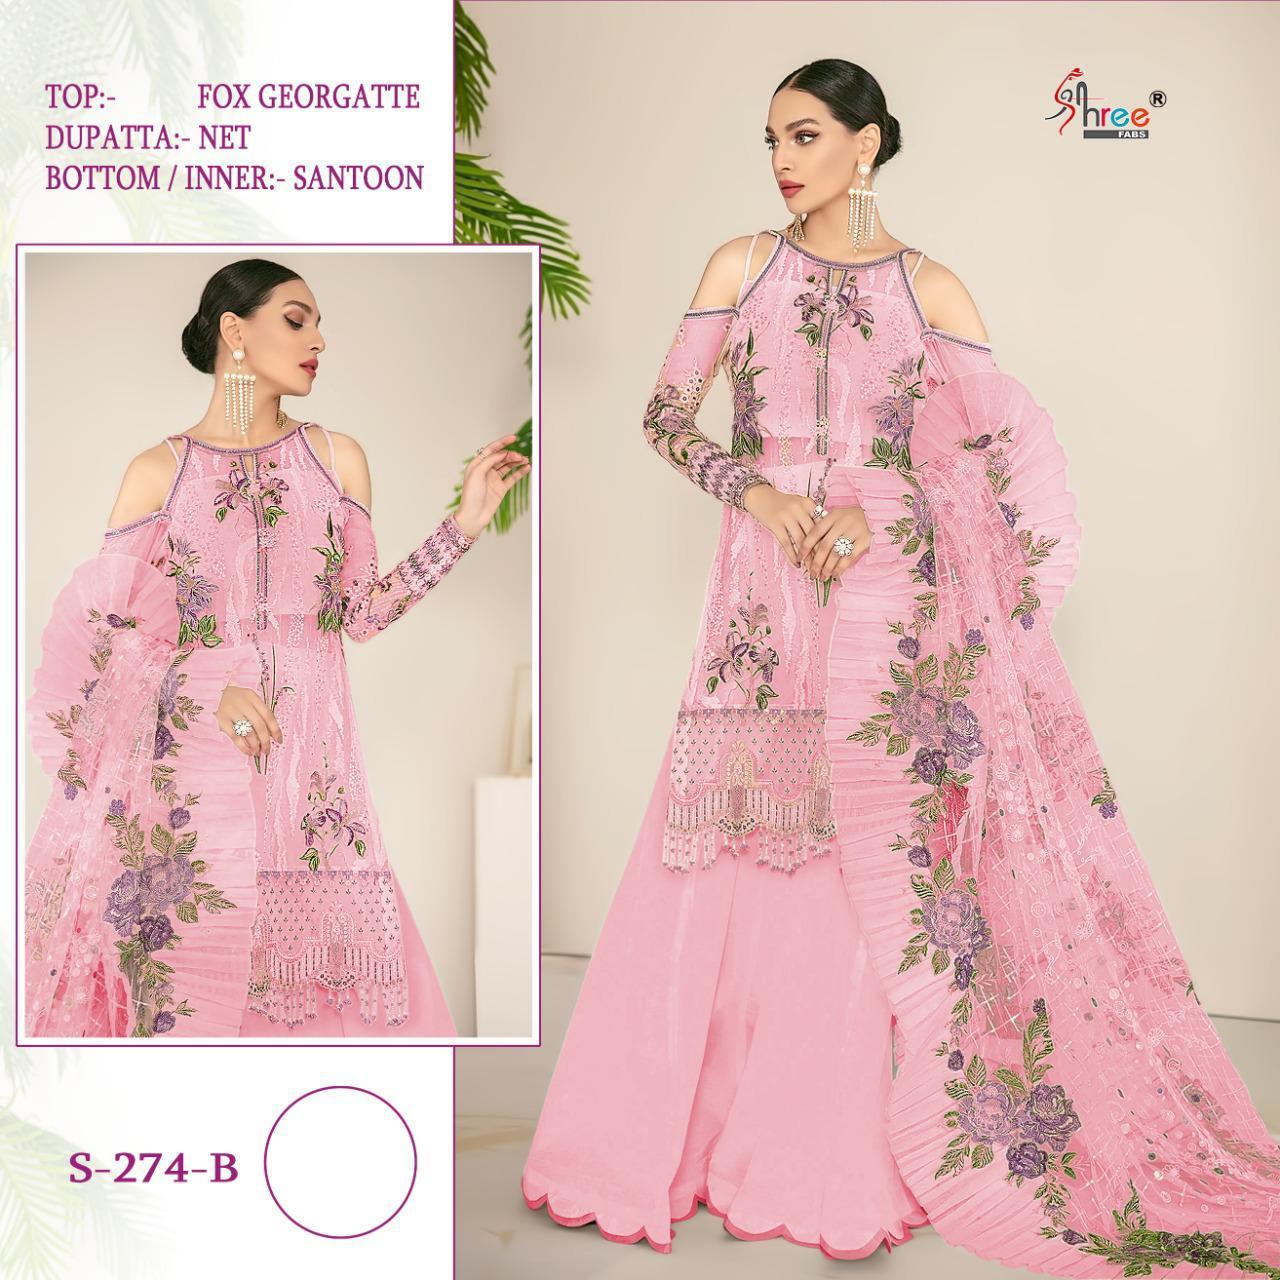 Shree Fab S-274 Colours Wholesale Pakistani Concept Dress